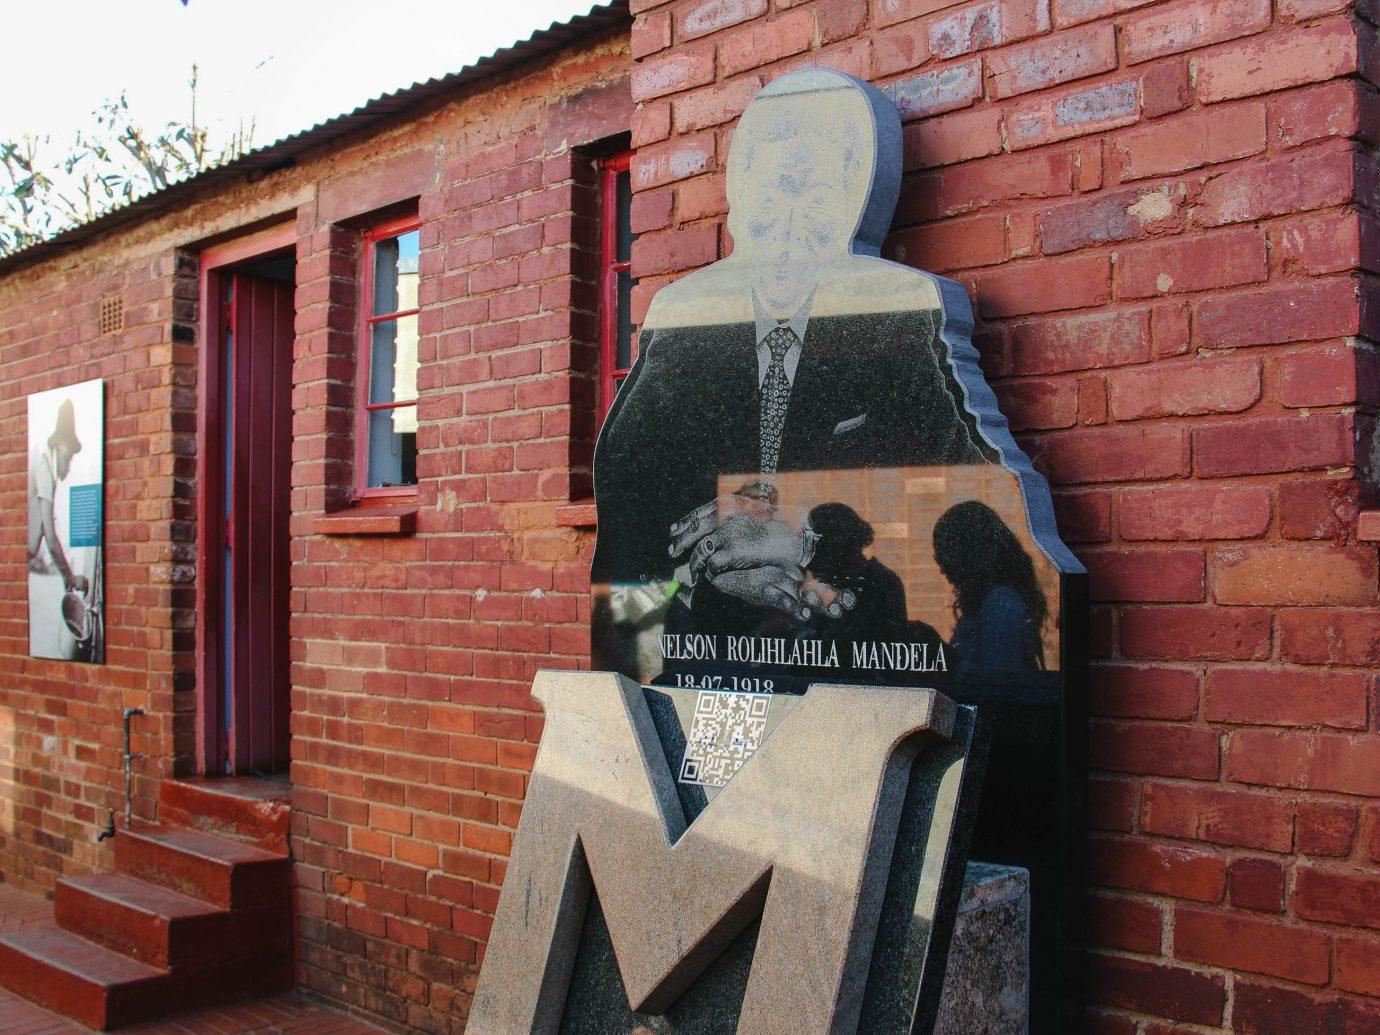 Arts + Culture Trip Ideas brick building outdoor wall house mural street art brickwork facade window